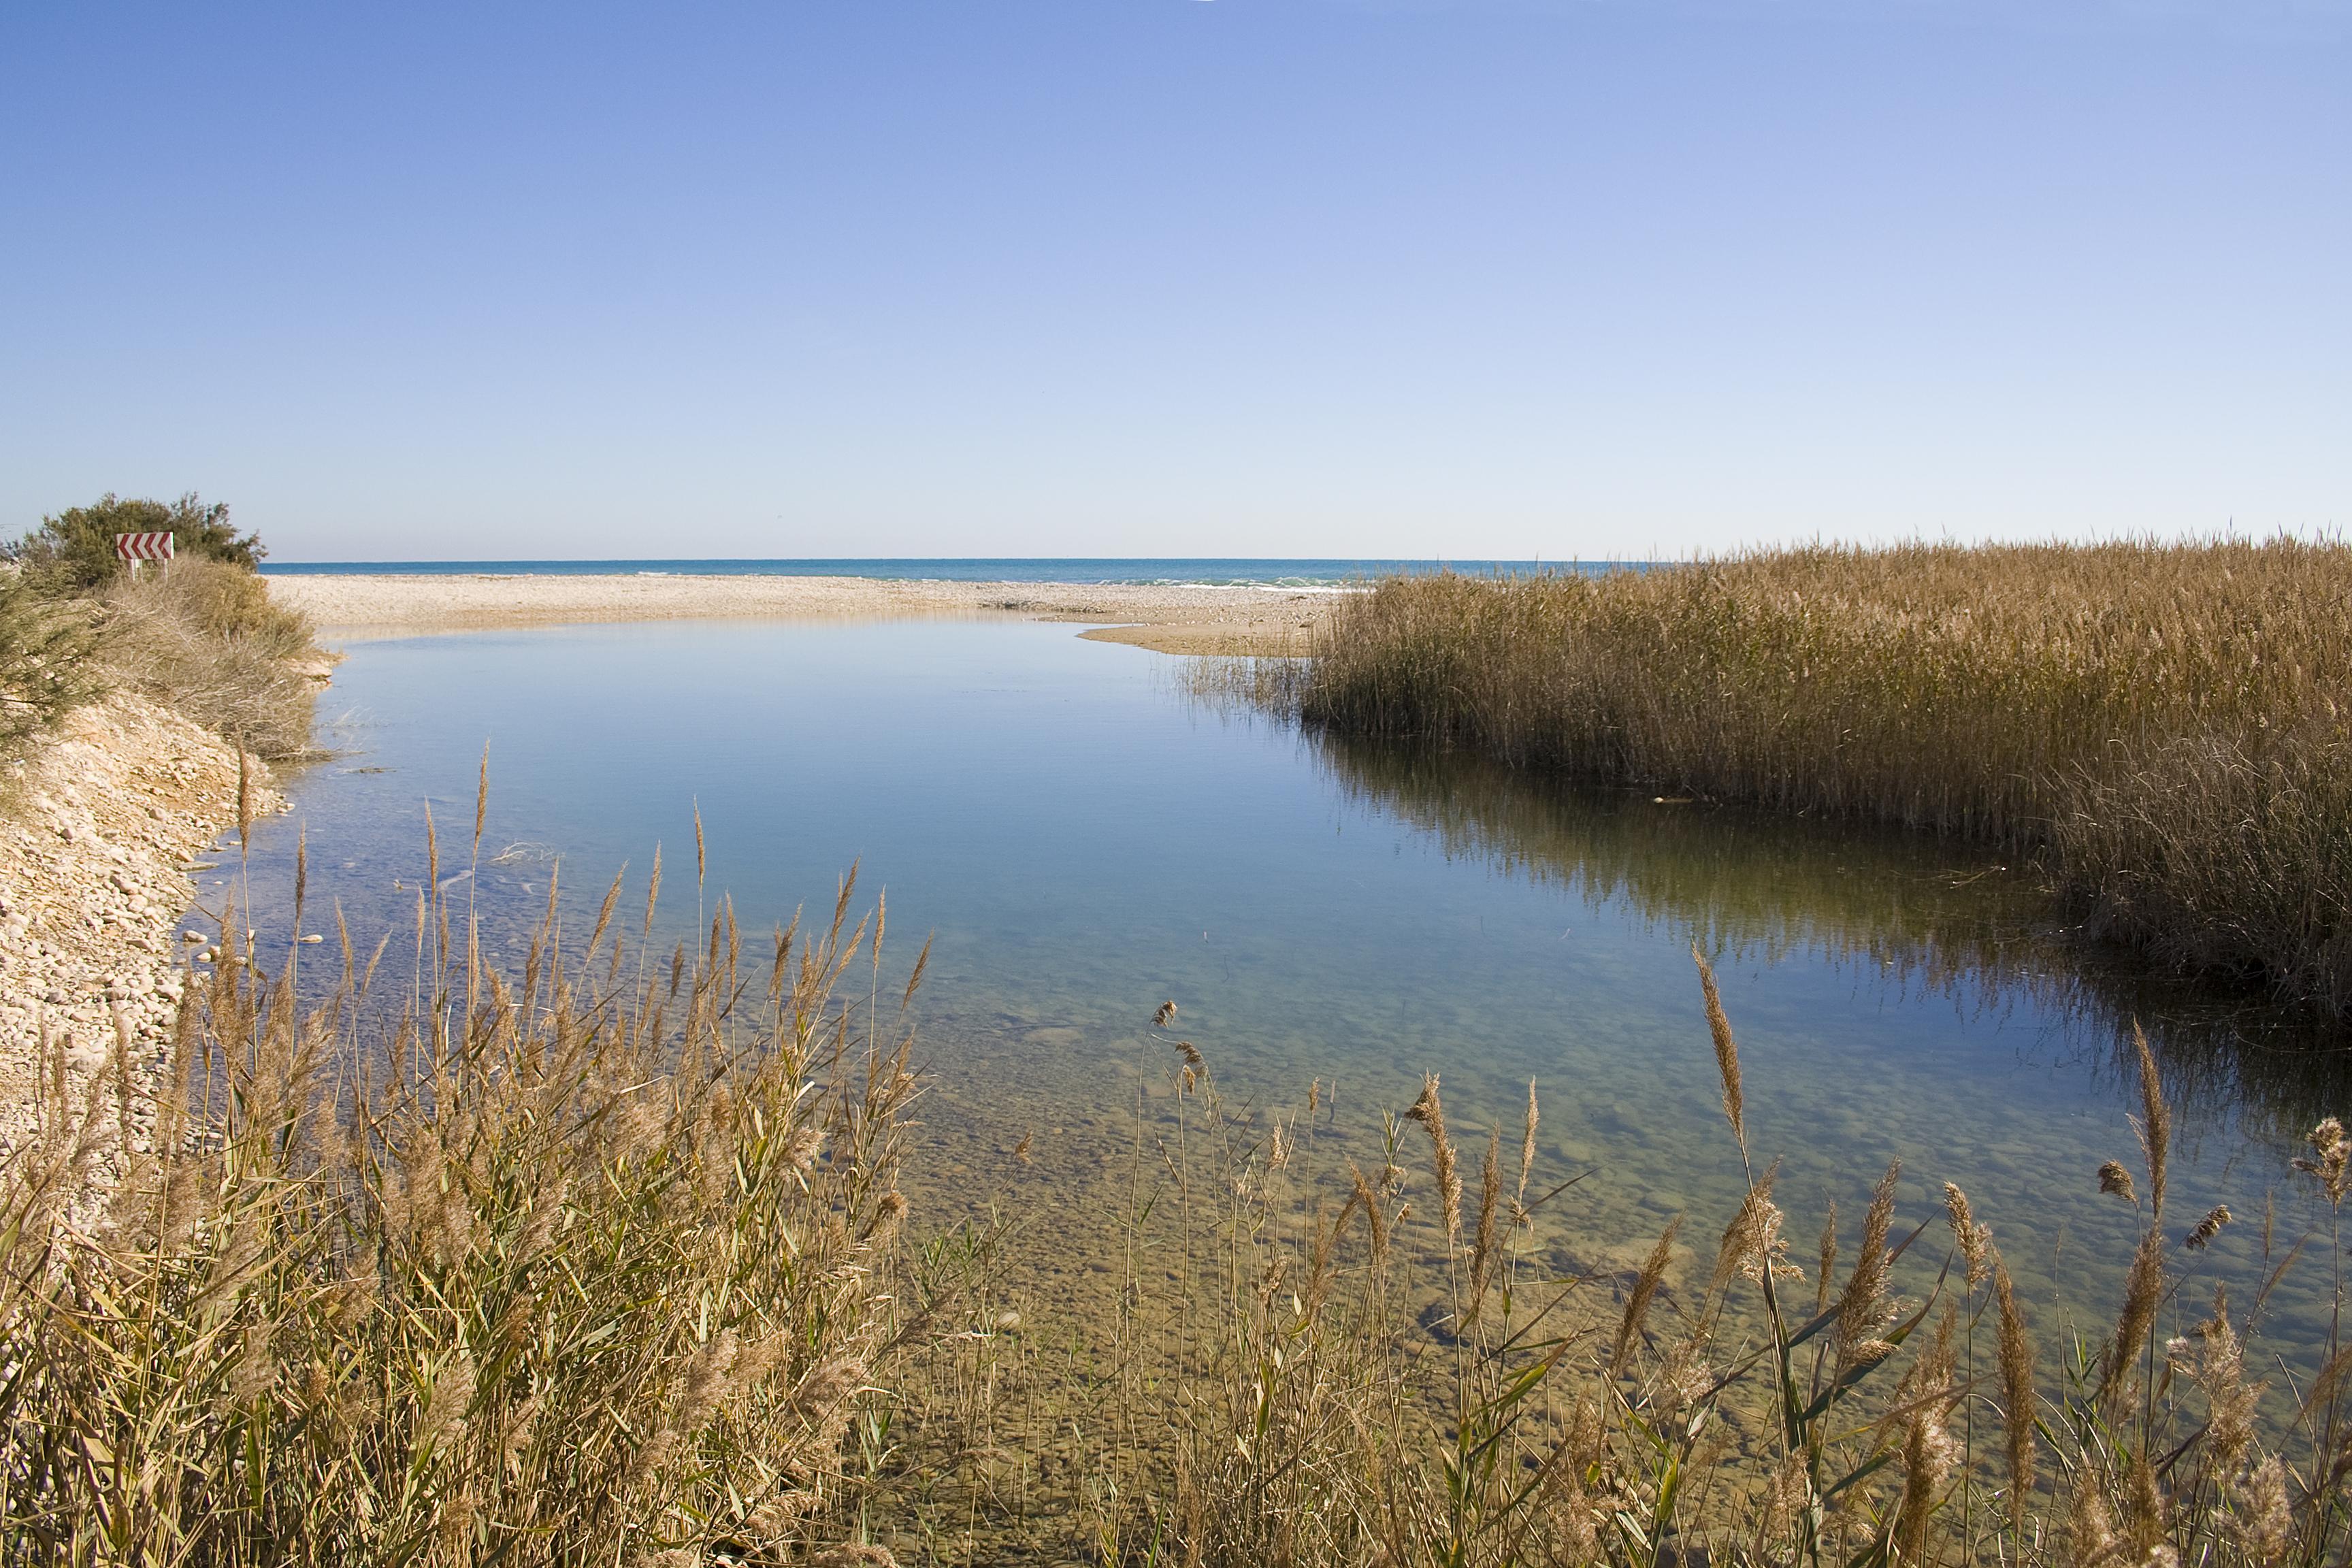 Desembocadura Rio San Miguel (2) reina